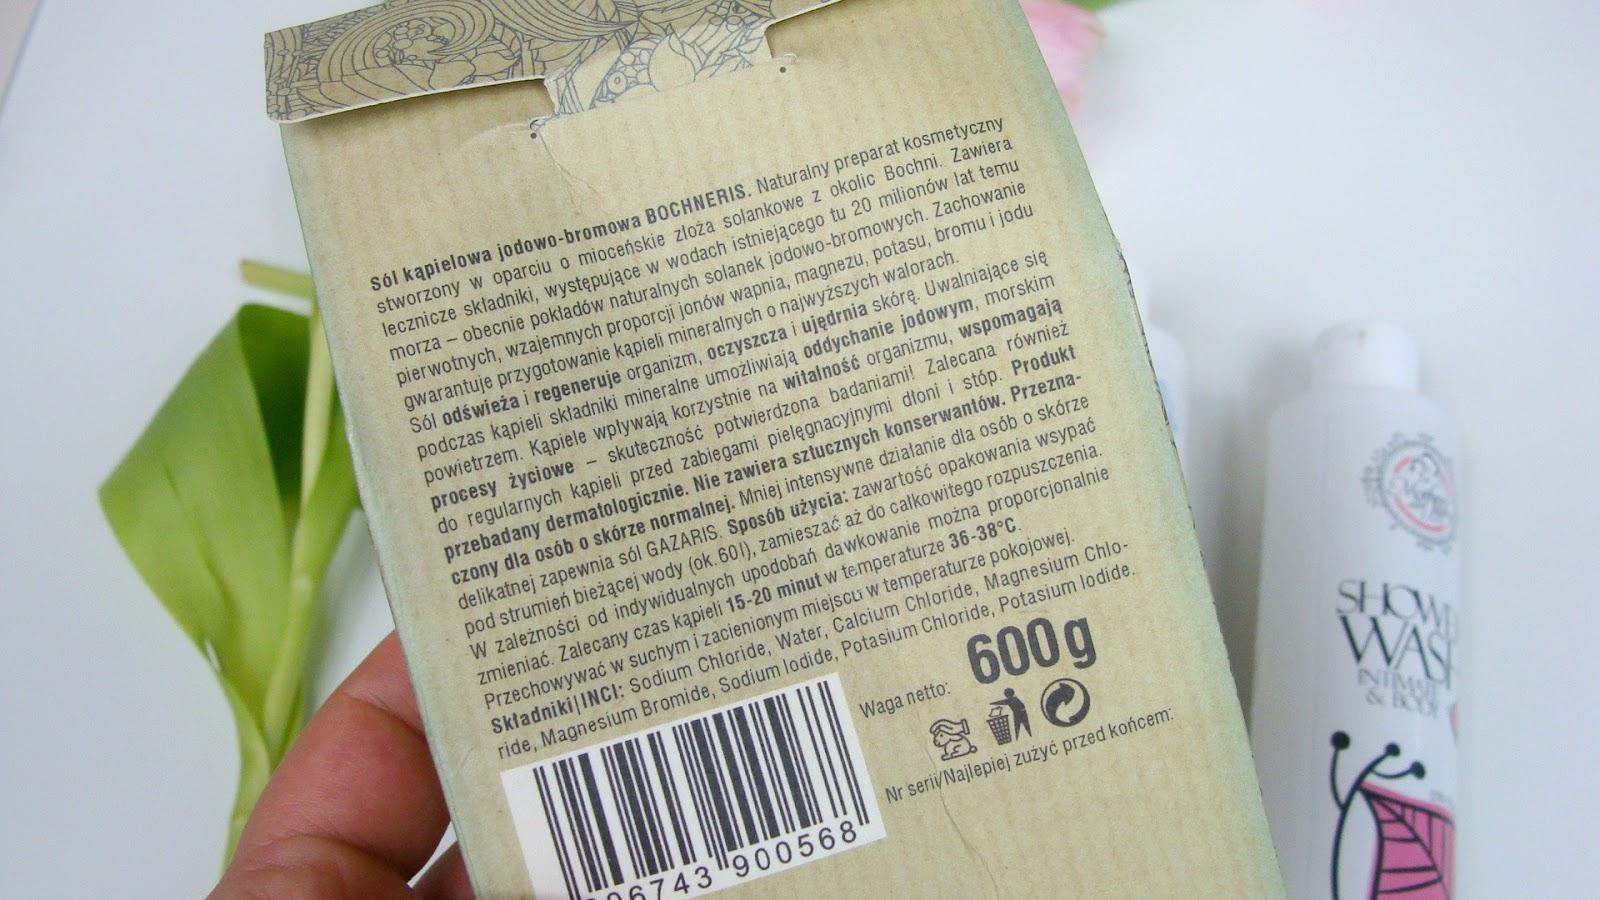 Bionigree szampon i odżywka, hristina mother and baby, kosmetyki bionigree, kosmetyki hristina, dezodoranty pony hutchen, sól bocheńska bochneris